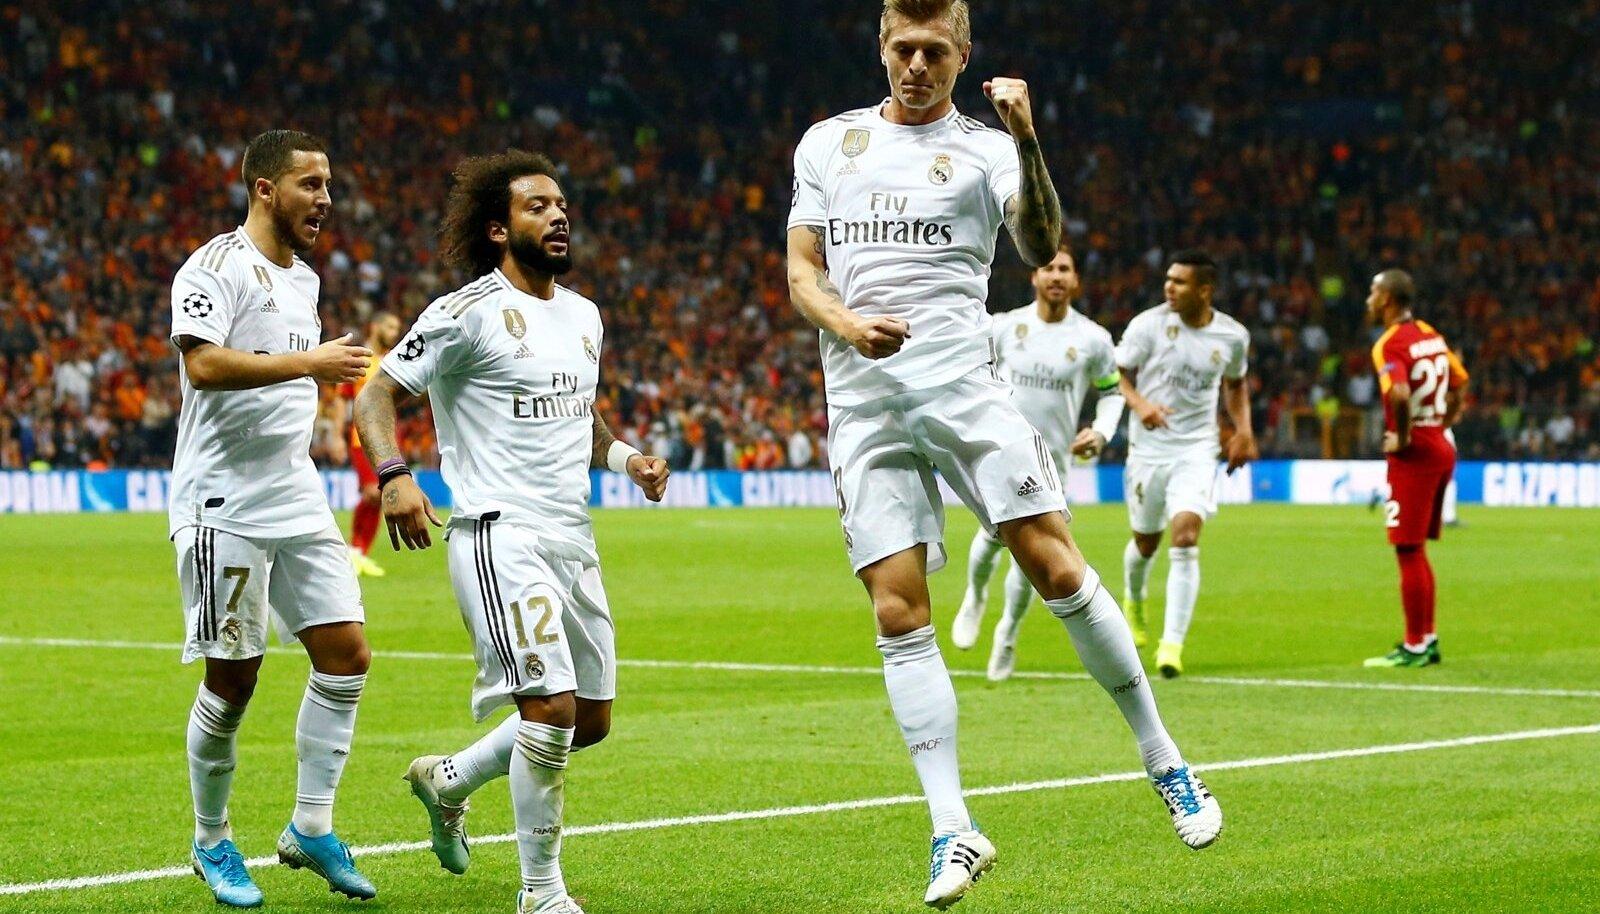 Champions League - Group A - Galatasaray v Real Madrid